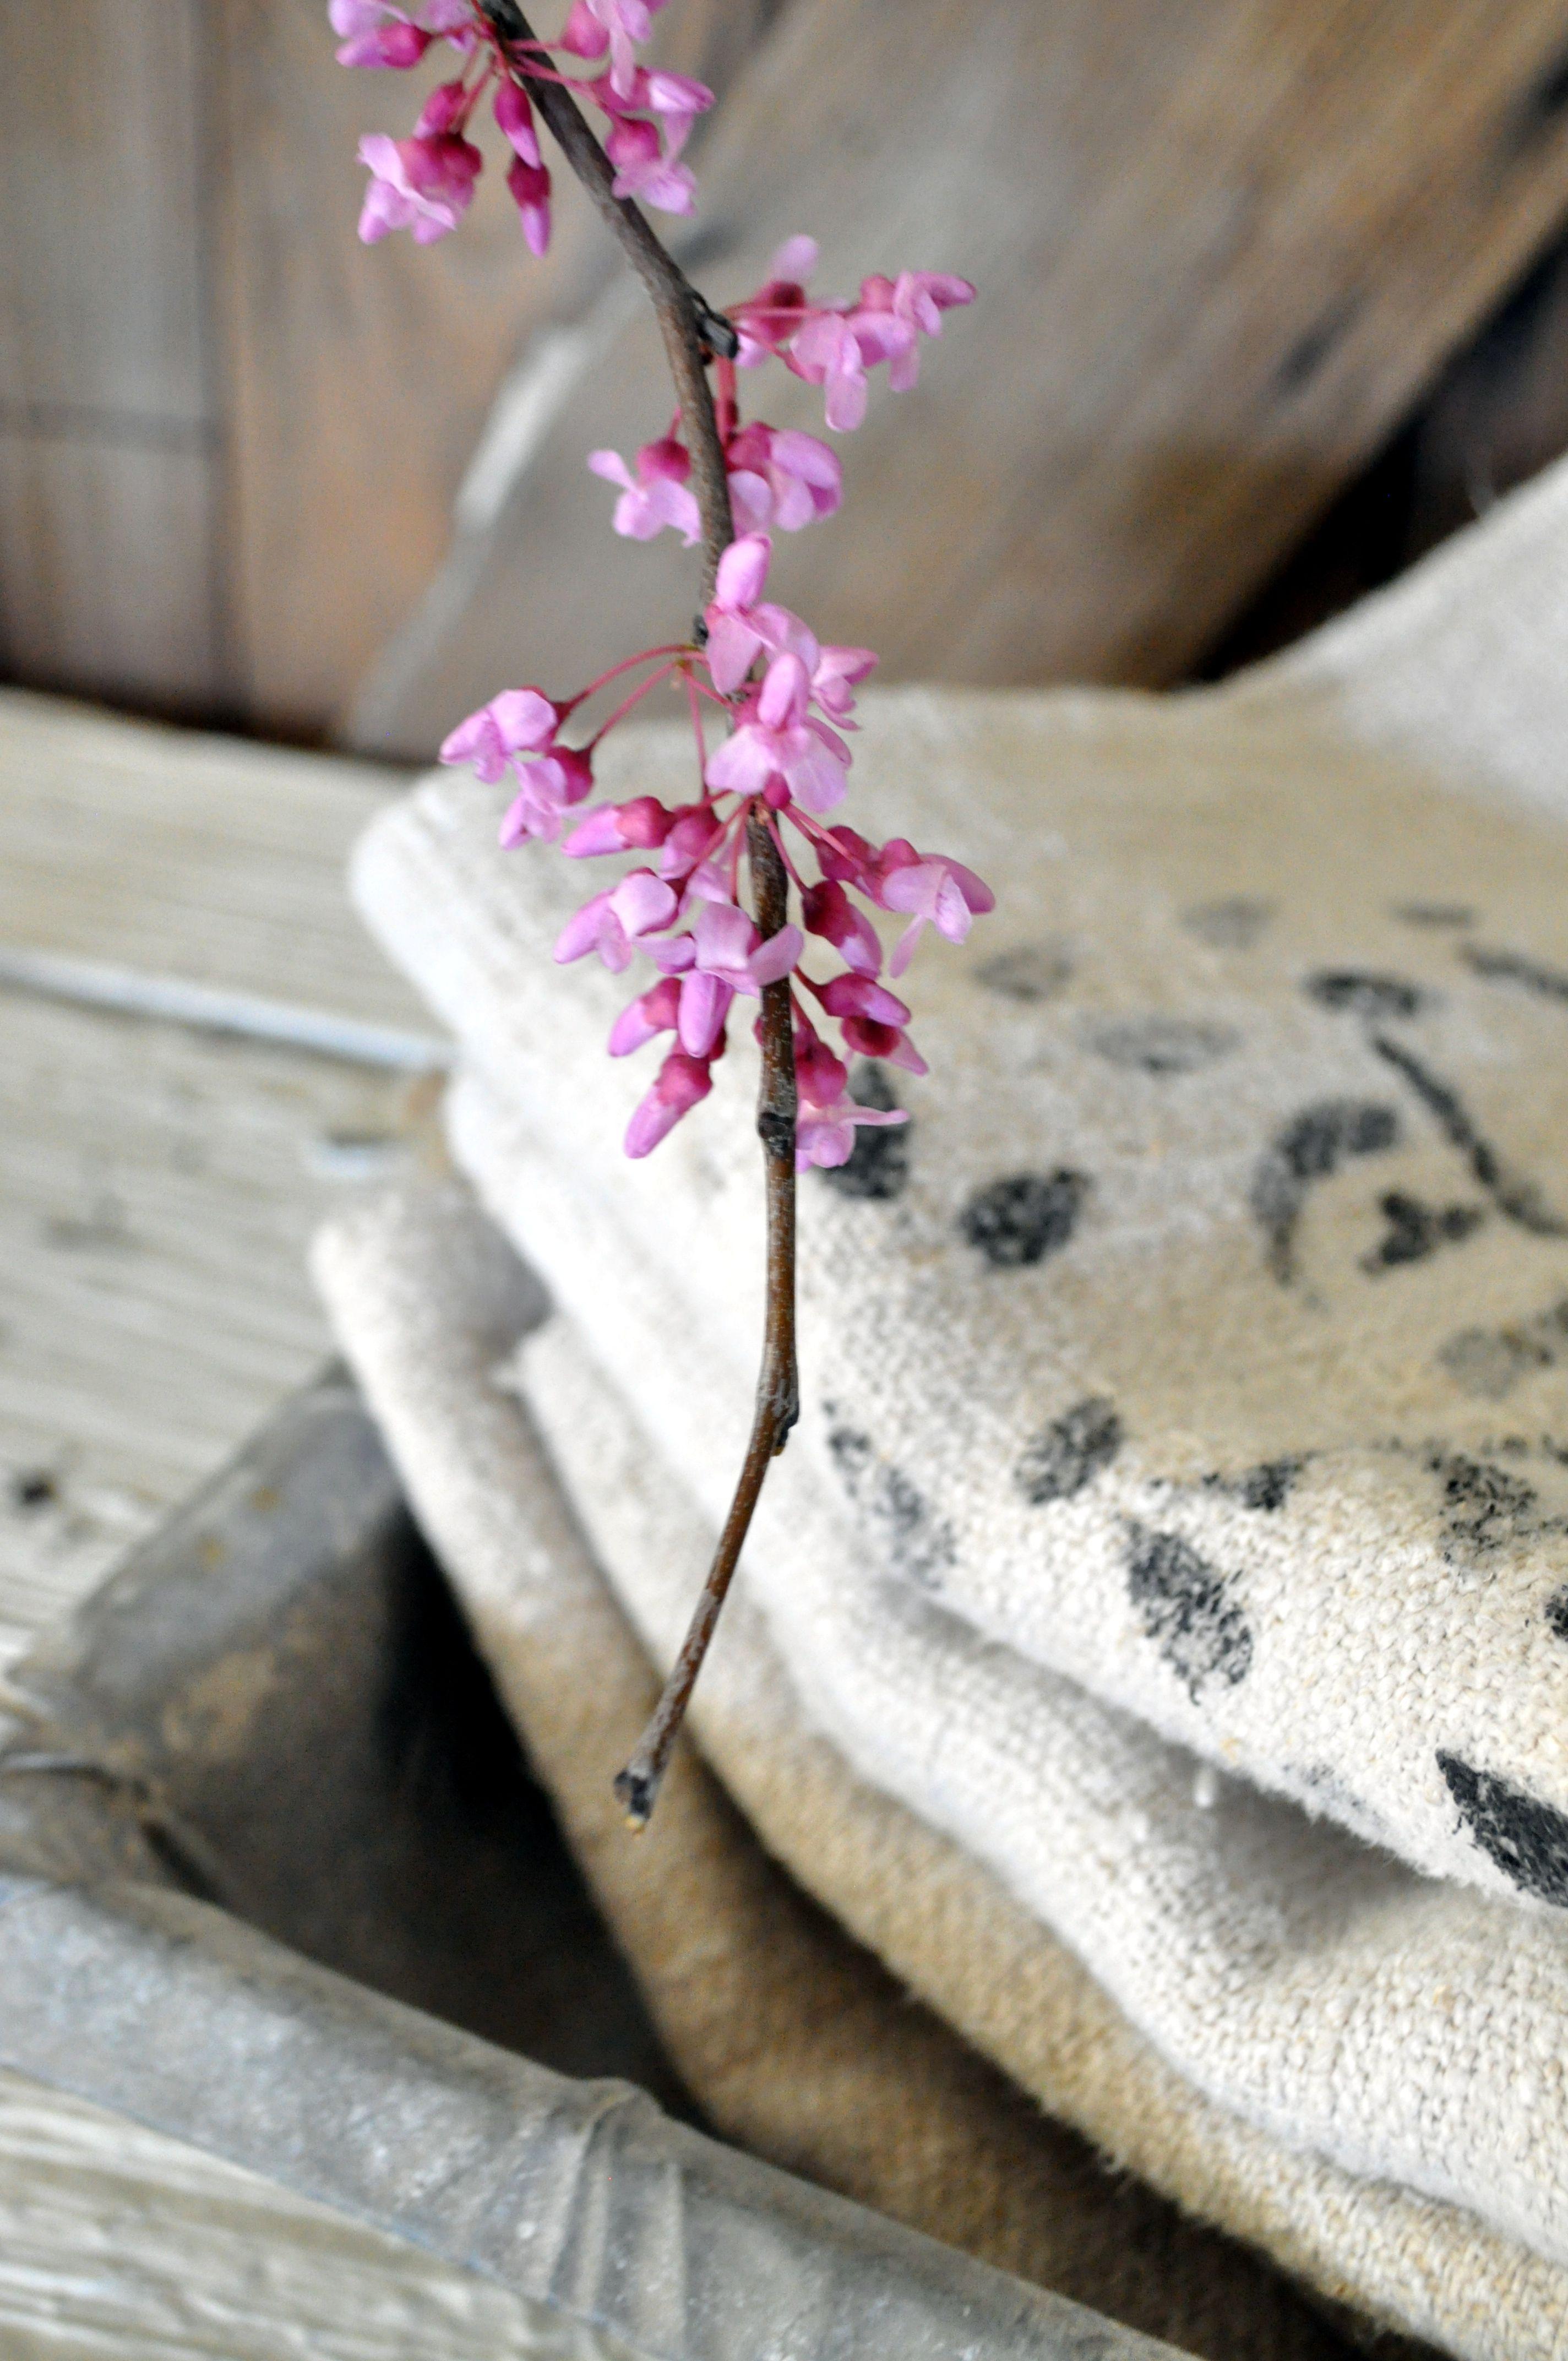 Red bud blooms and grain sacks